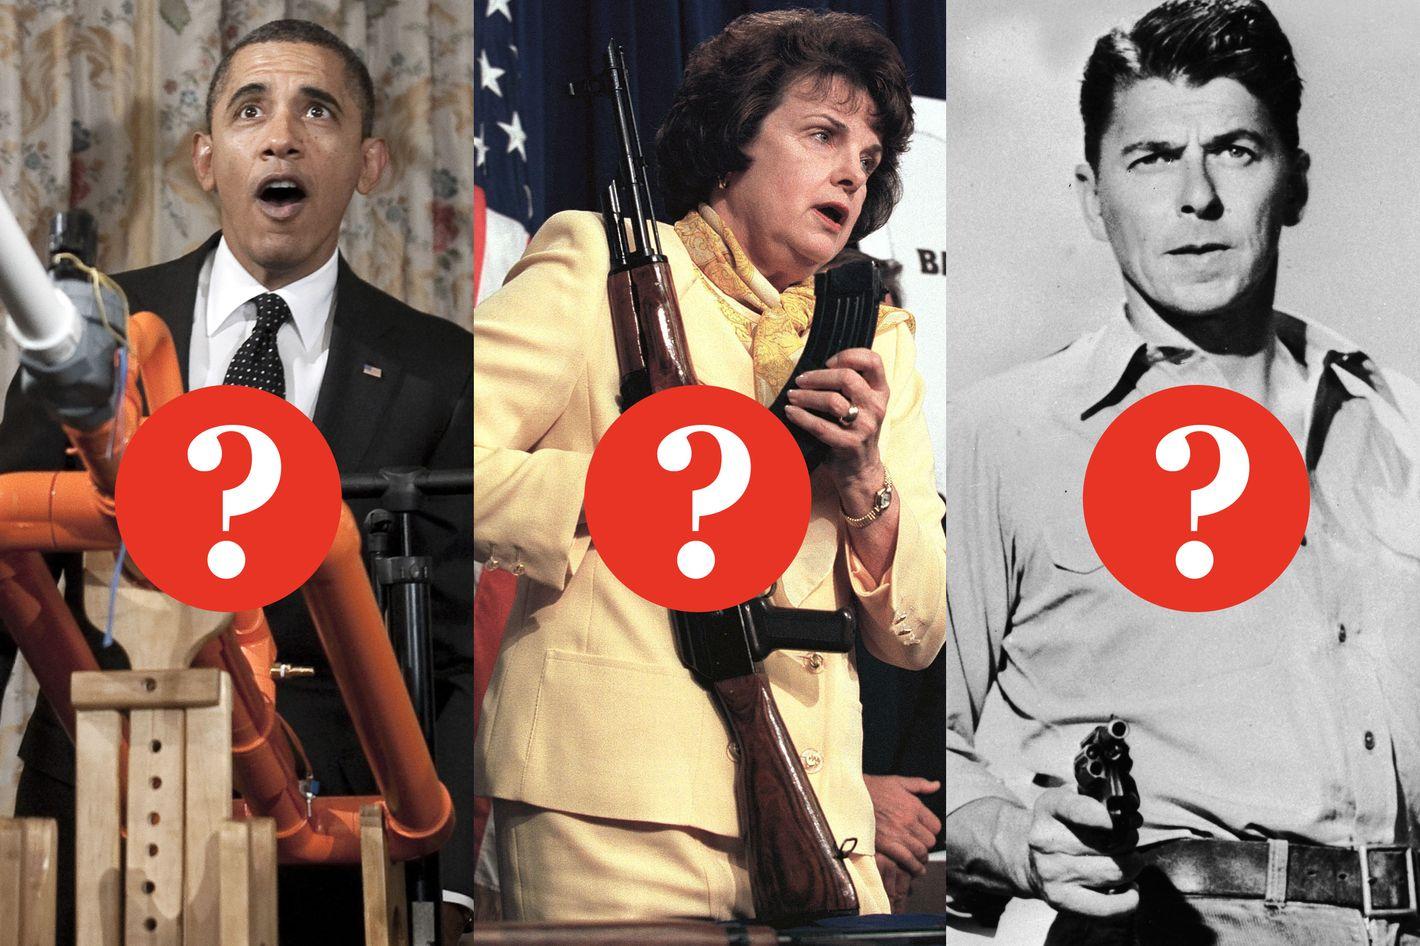 Gun Control Quotes Identify The Guncontrol Quote Obama Feinstein Or Reagan